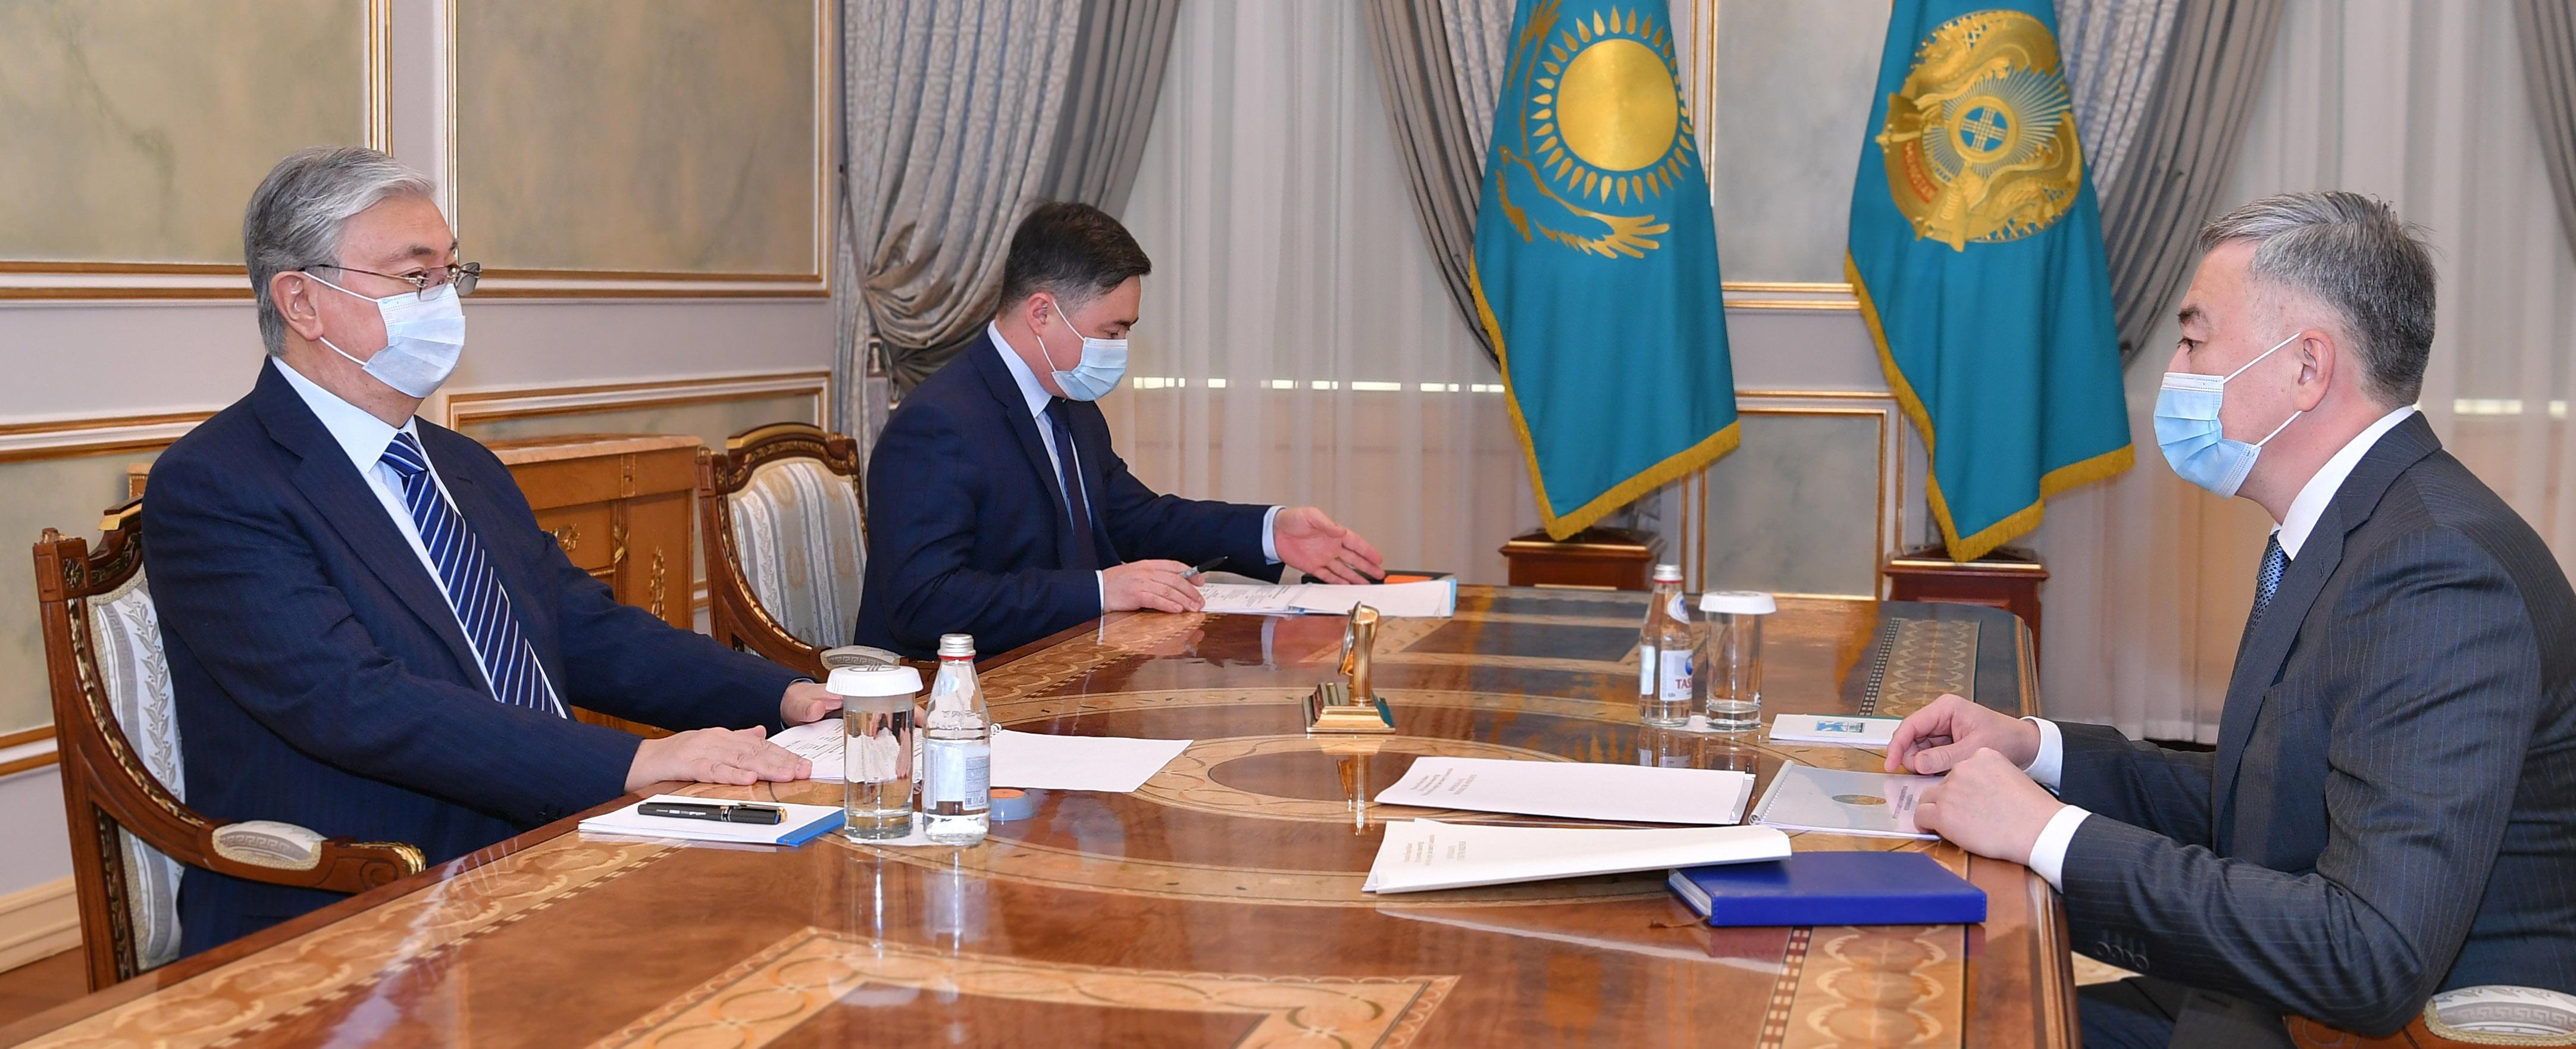 Глава государства принял председателя агентства по защите и развитию конкуренции